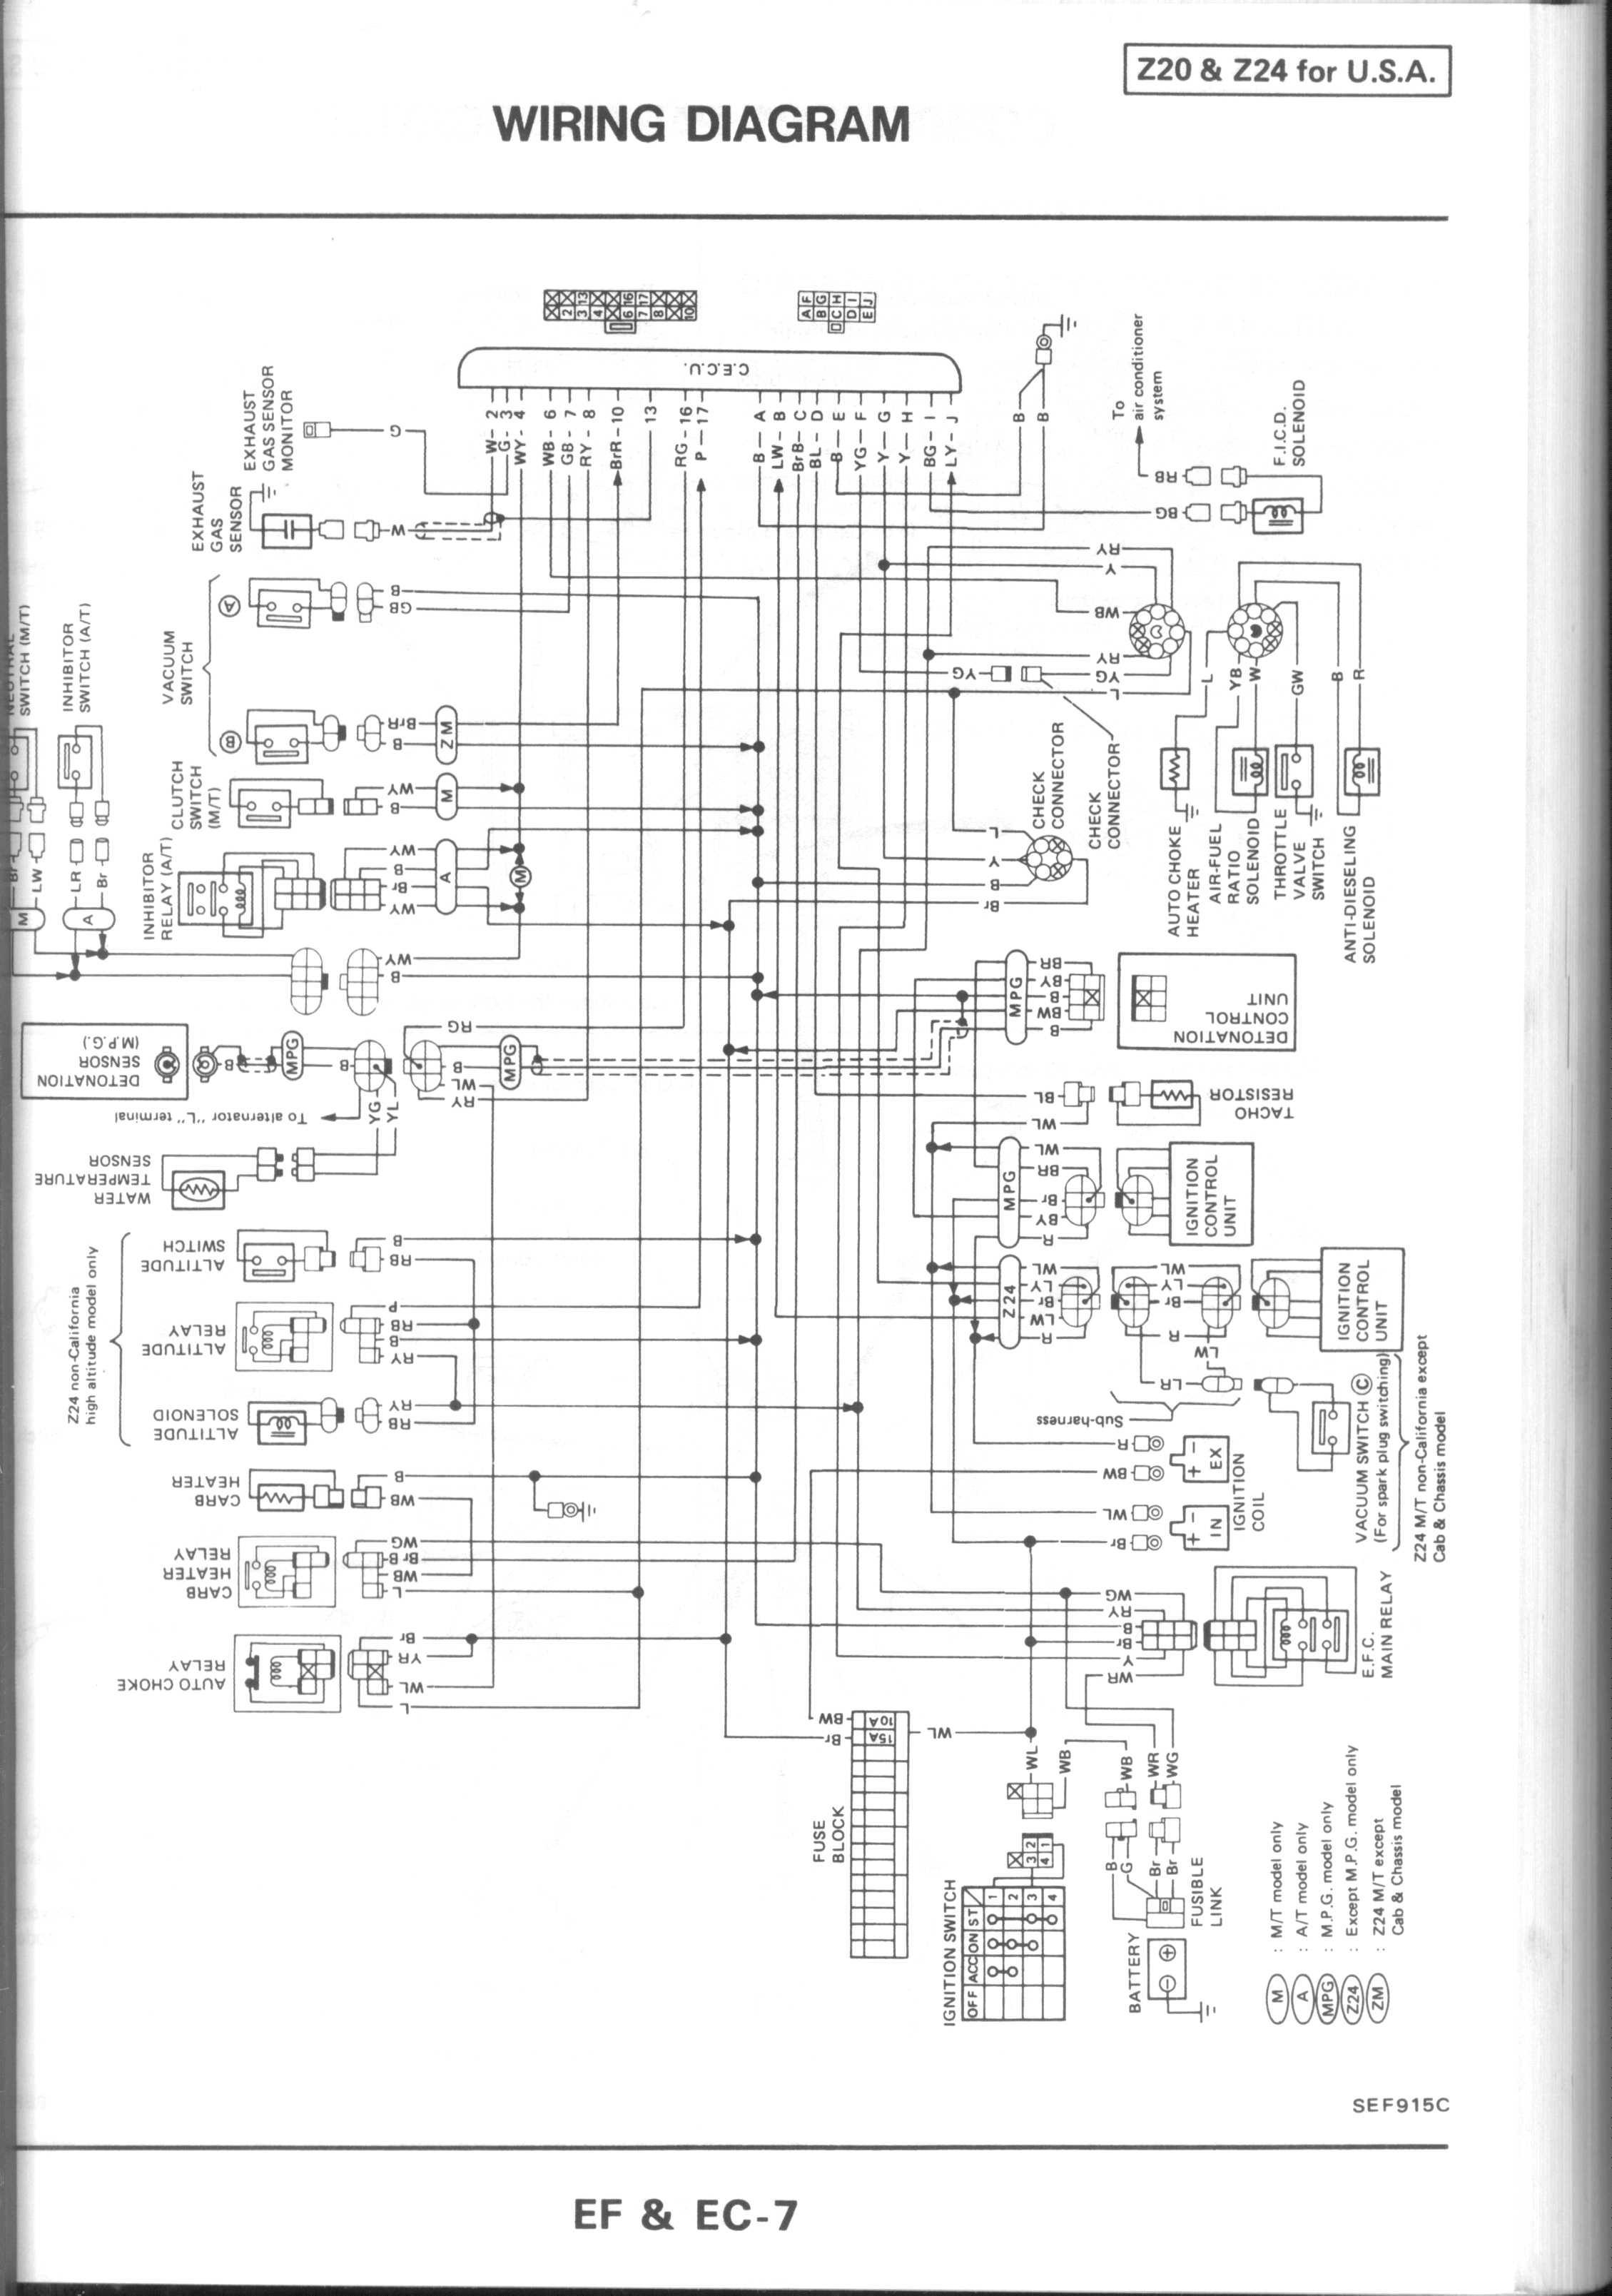 1995 Nissan Pickup Engine Diagram Diagram Also 1980 Nissan Pulsar Nx Wiring Harness Wiring Diagram Of 1995 Nissan Pickup Engine Diagram